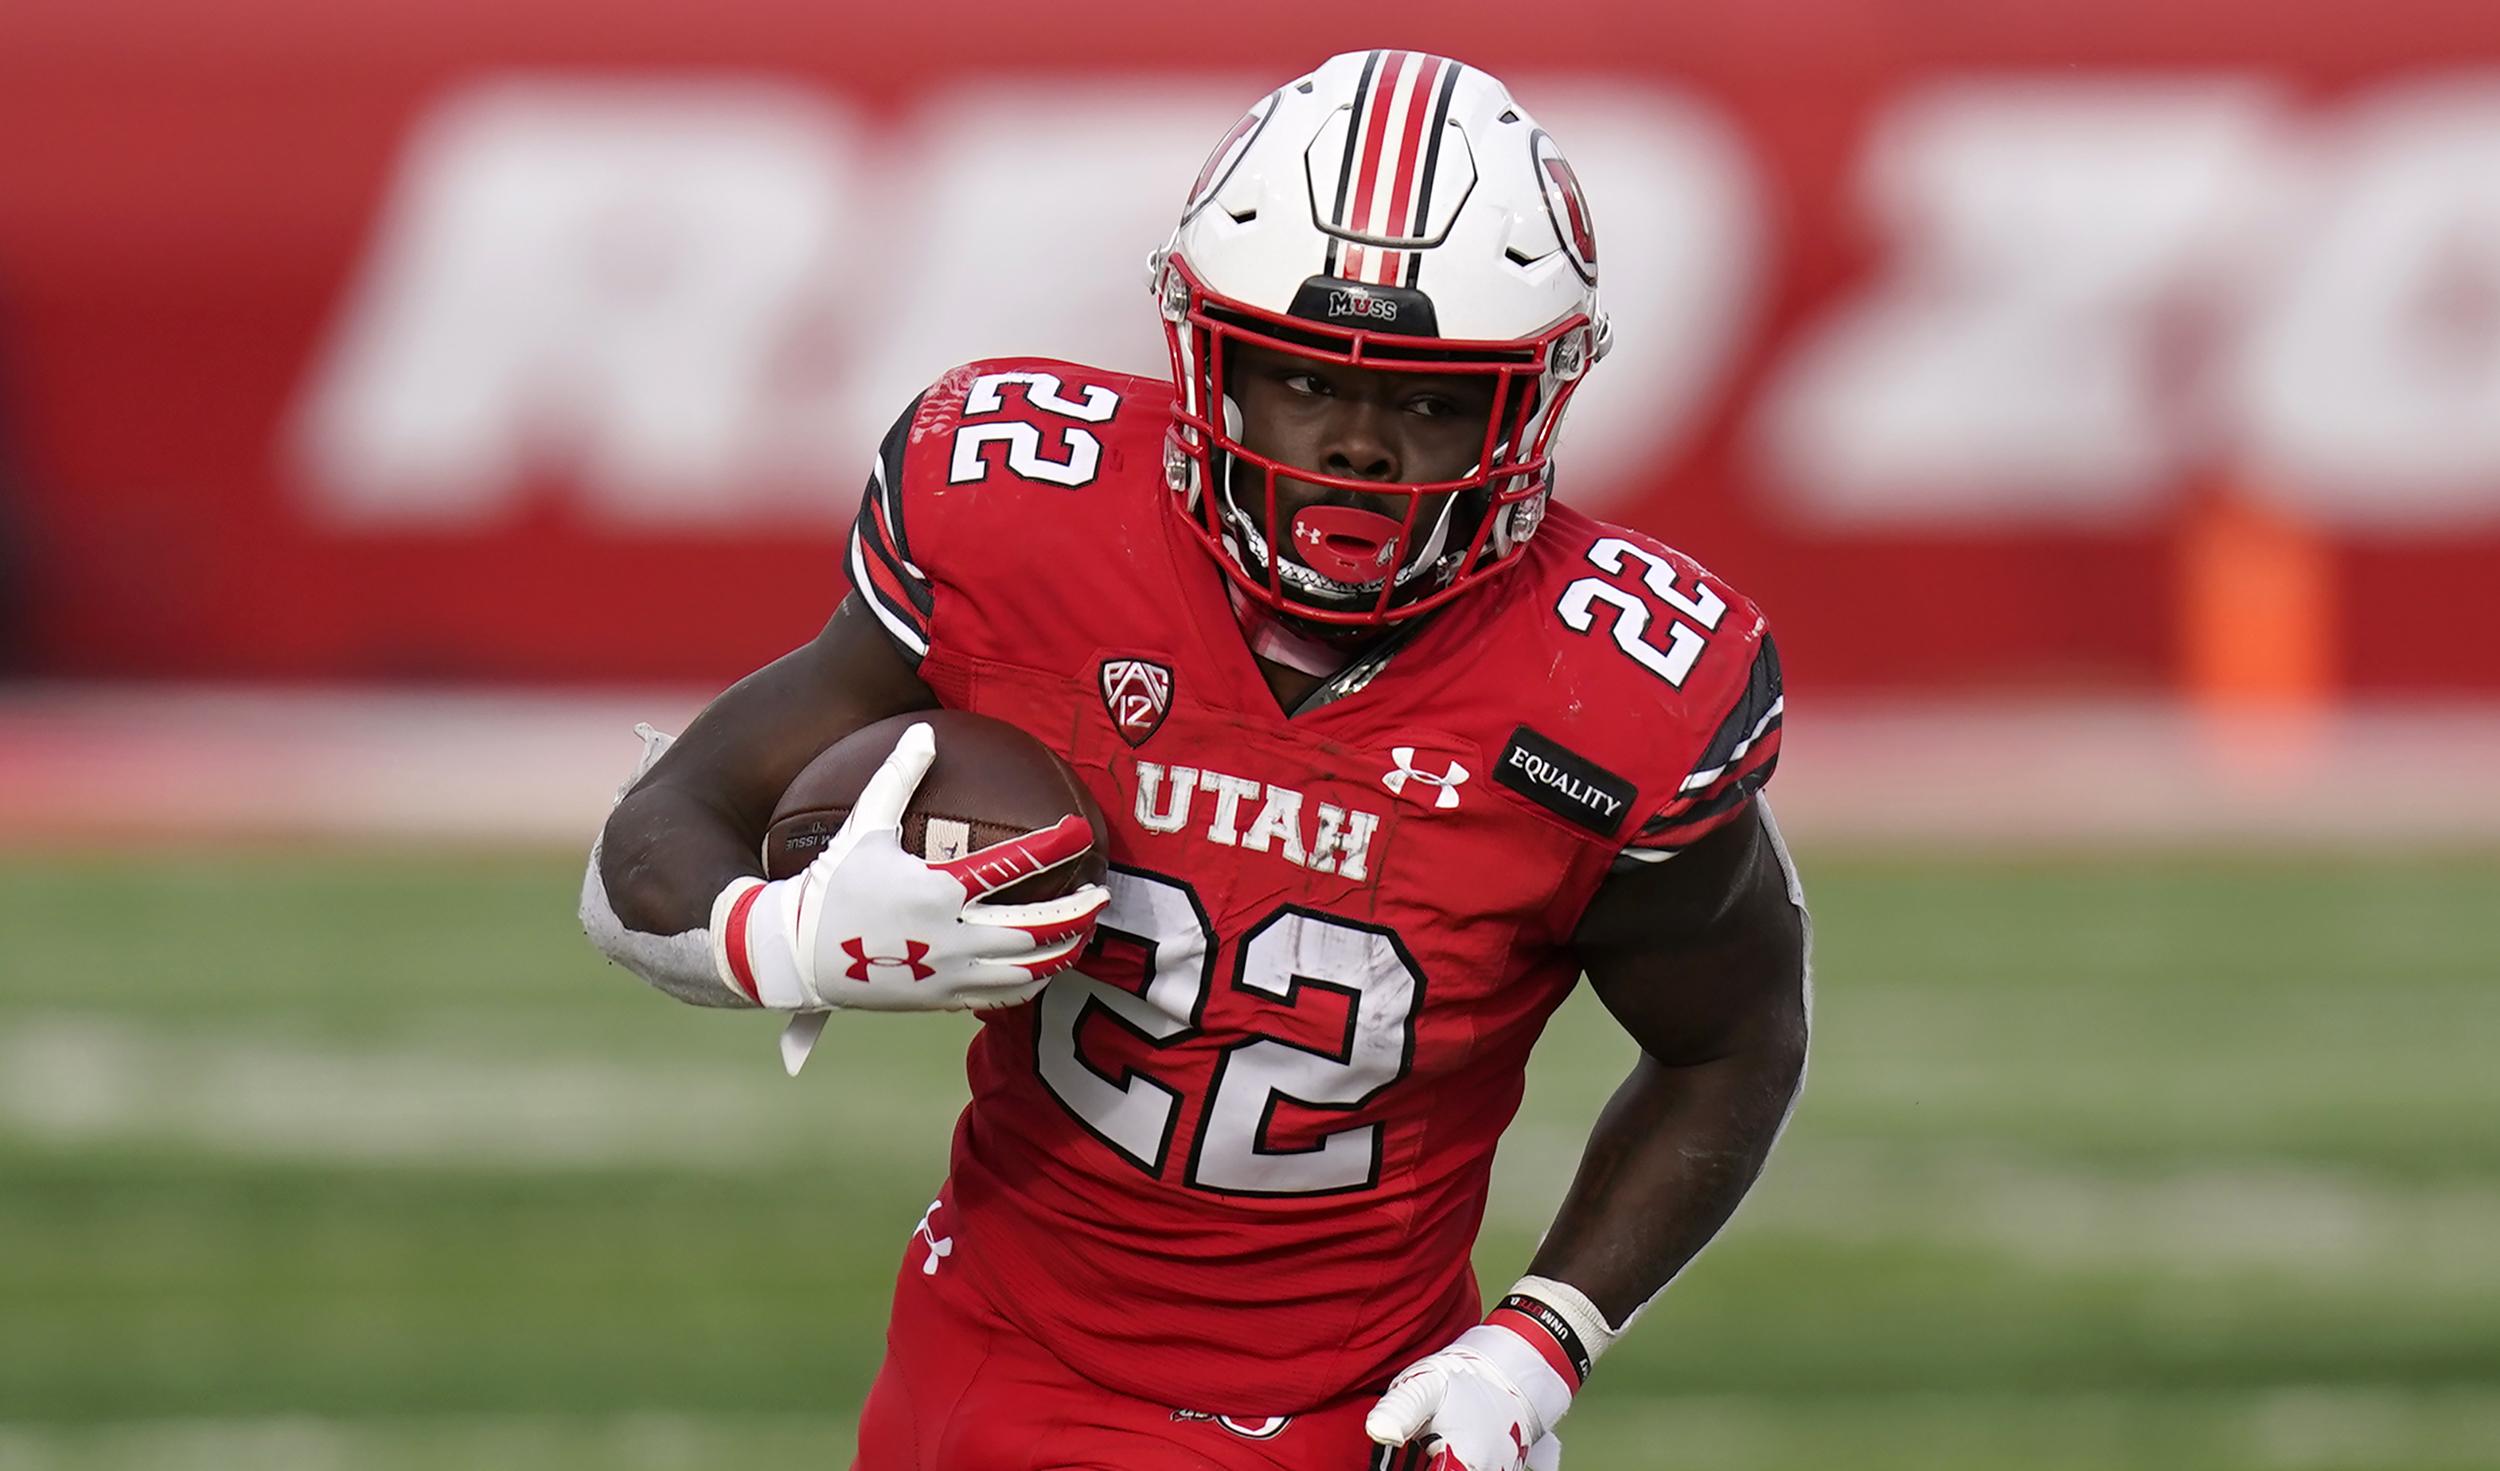 Utah football player Ty Jordan, Pac-12 offensive freshman of the year, dies